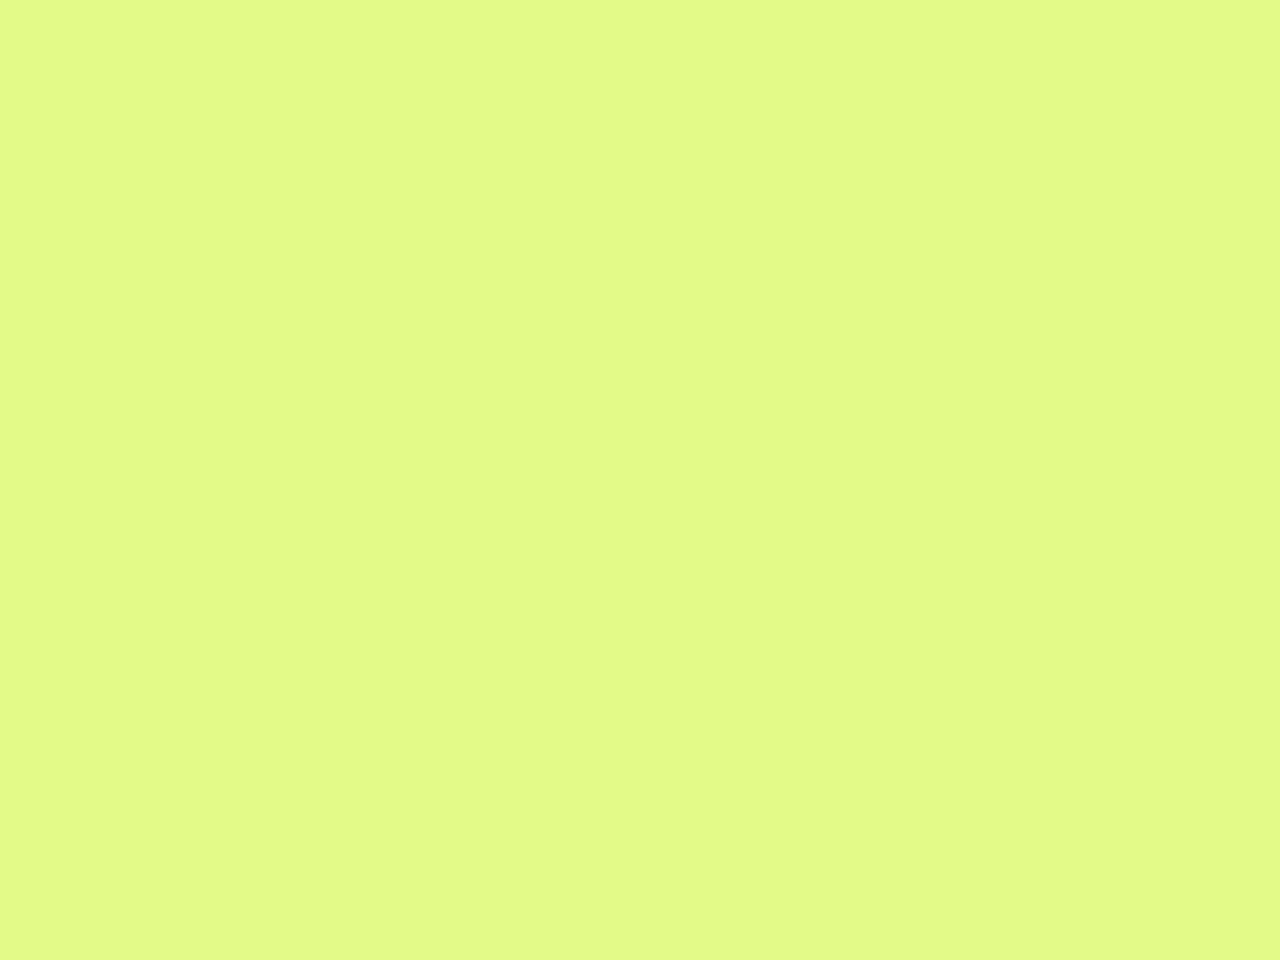 1280x960 Midori Solid Color Background